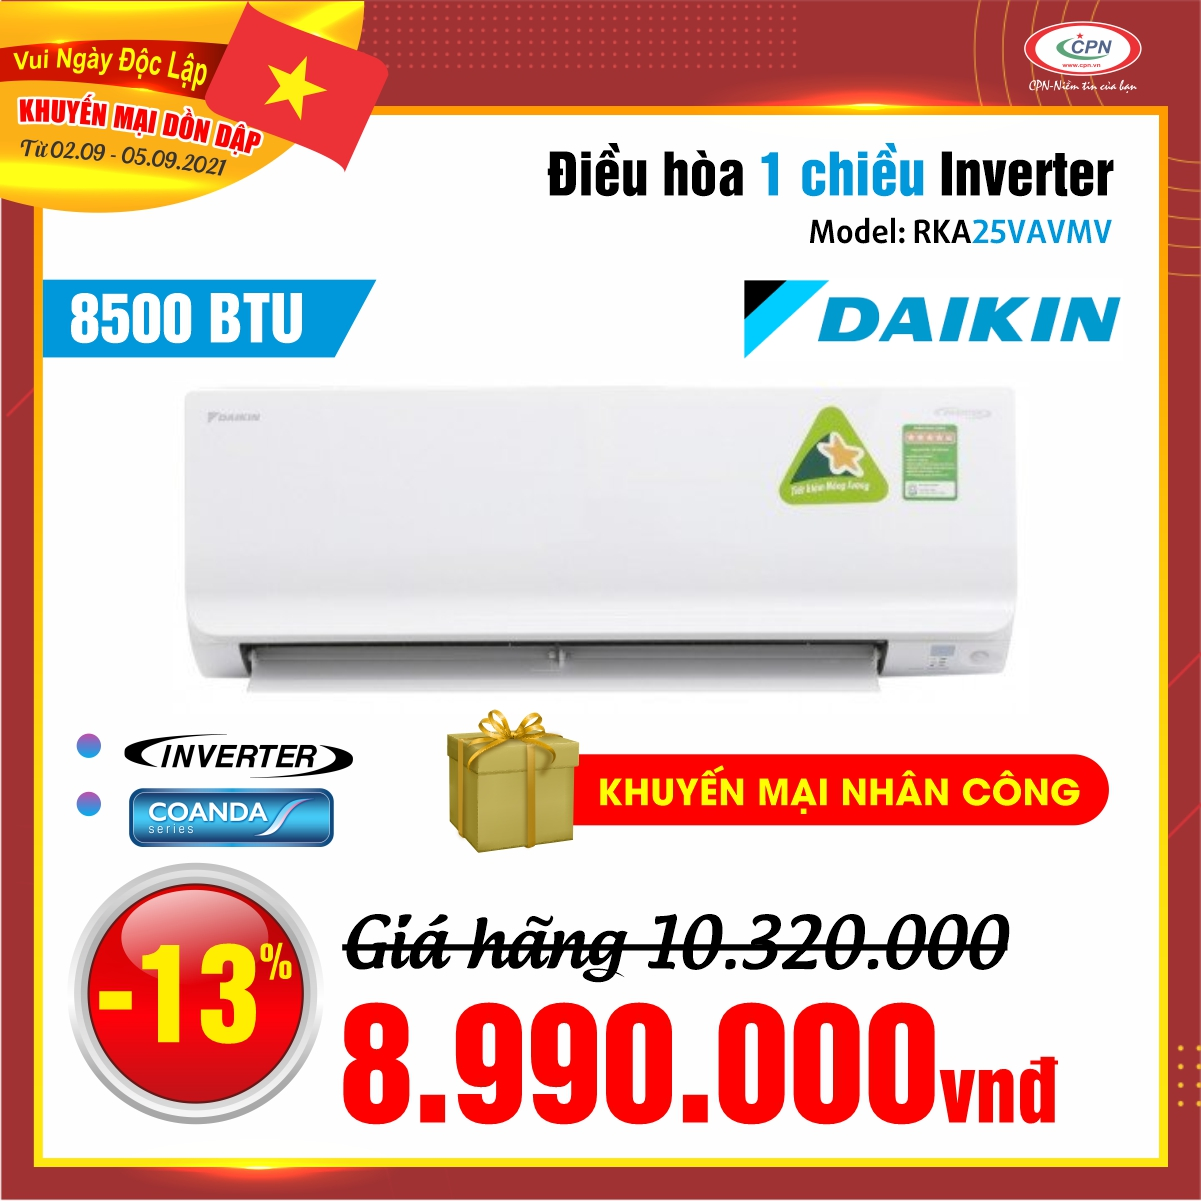 900x900-quoc-khanh-2021-rka25vavmv.jpg